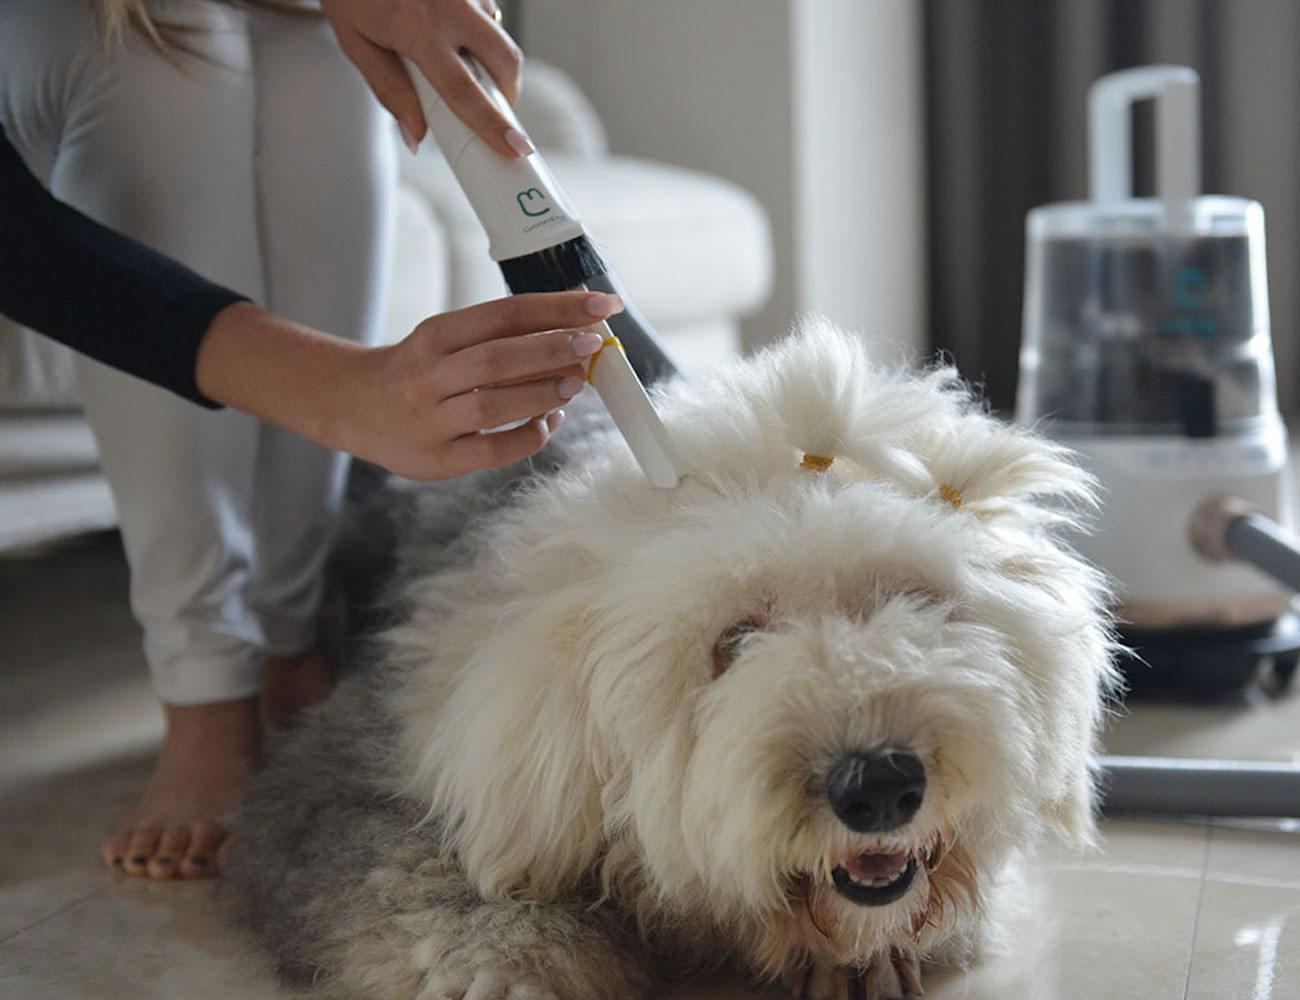 GroomPal Mess-Free Dog Grooming Device